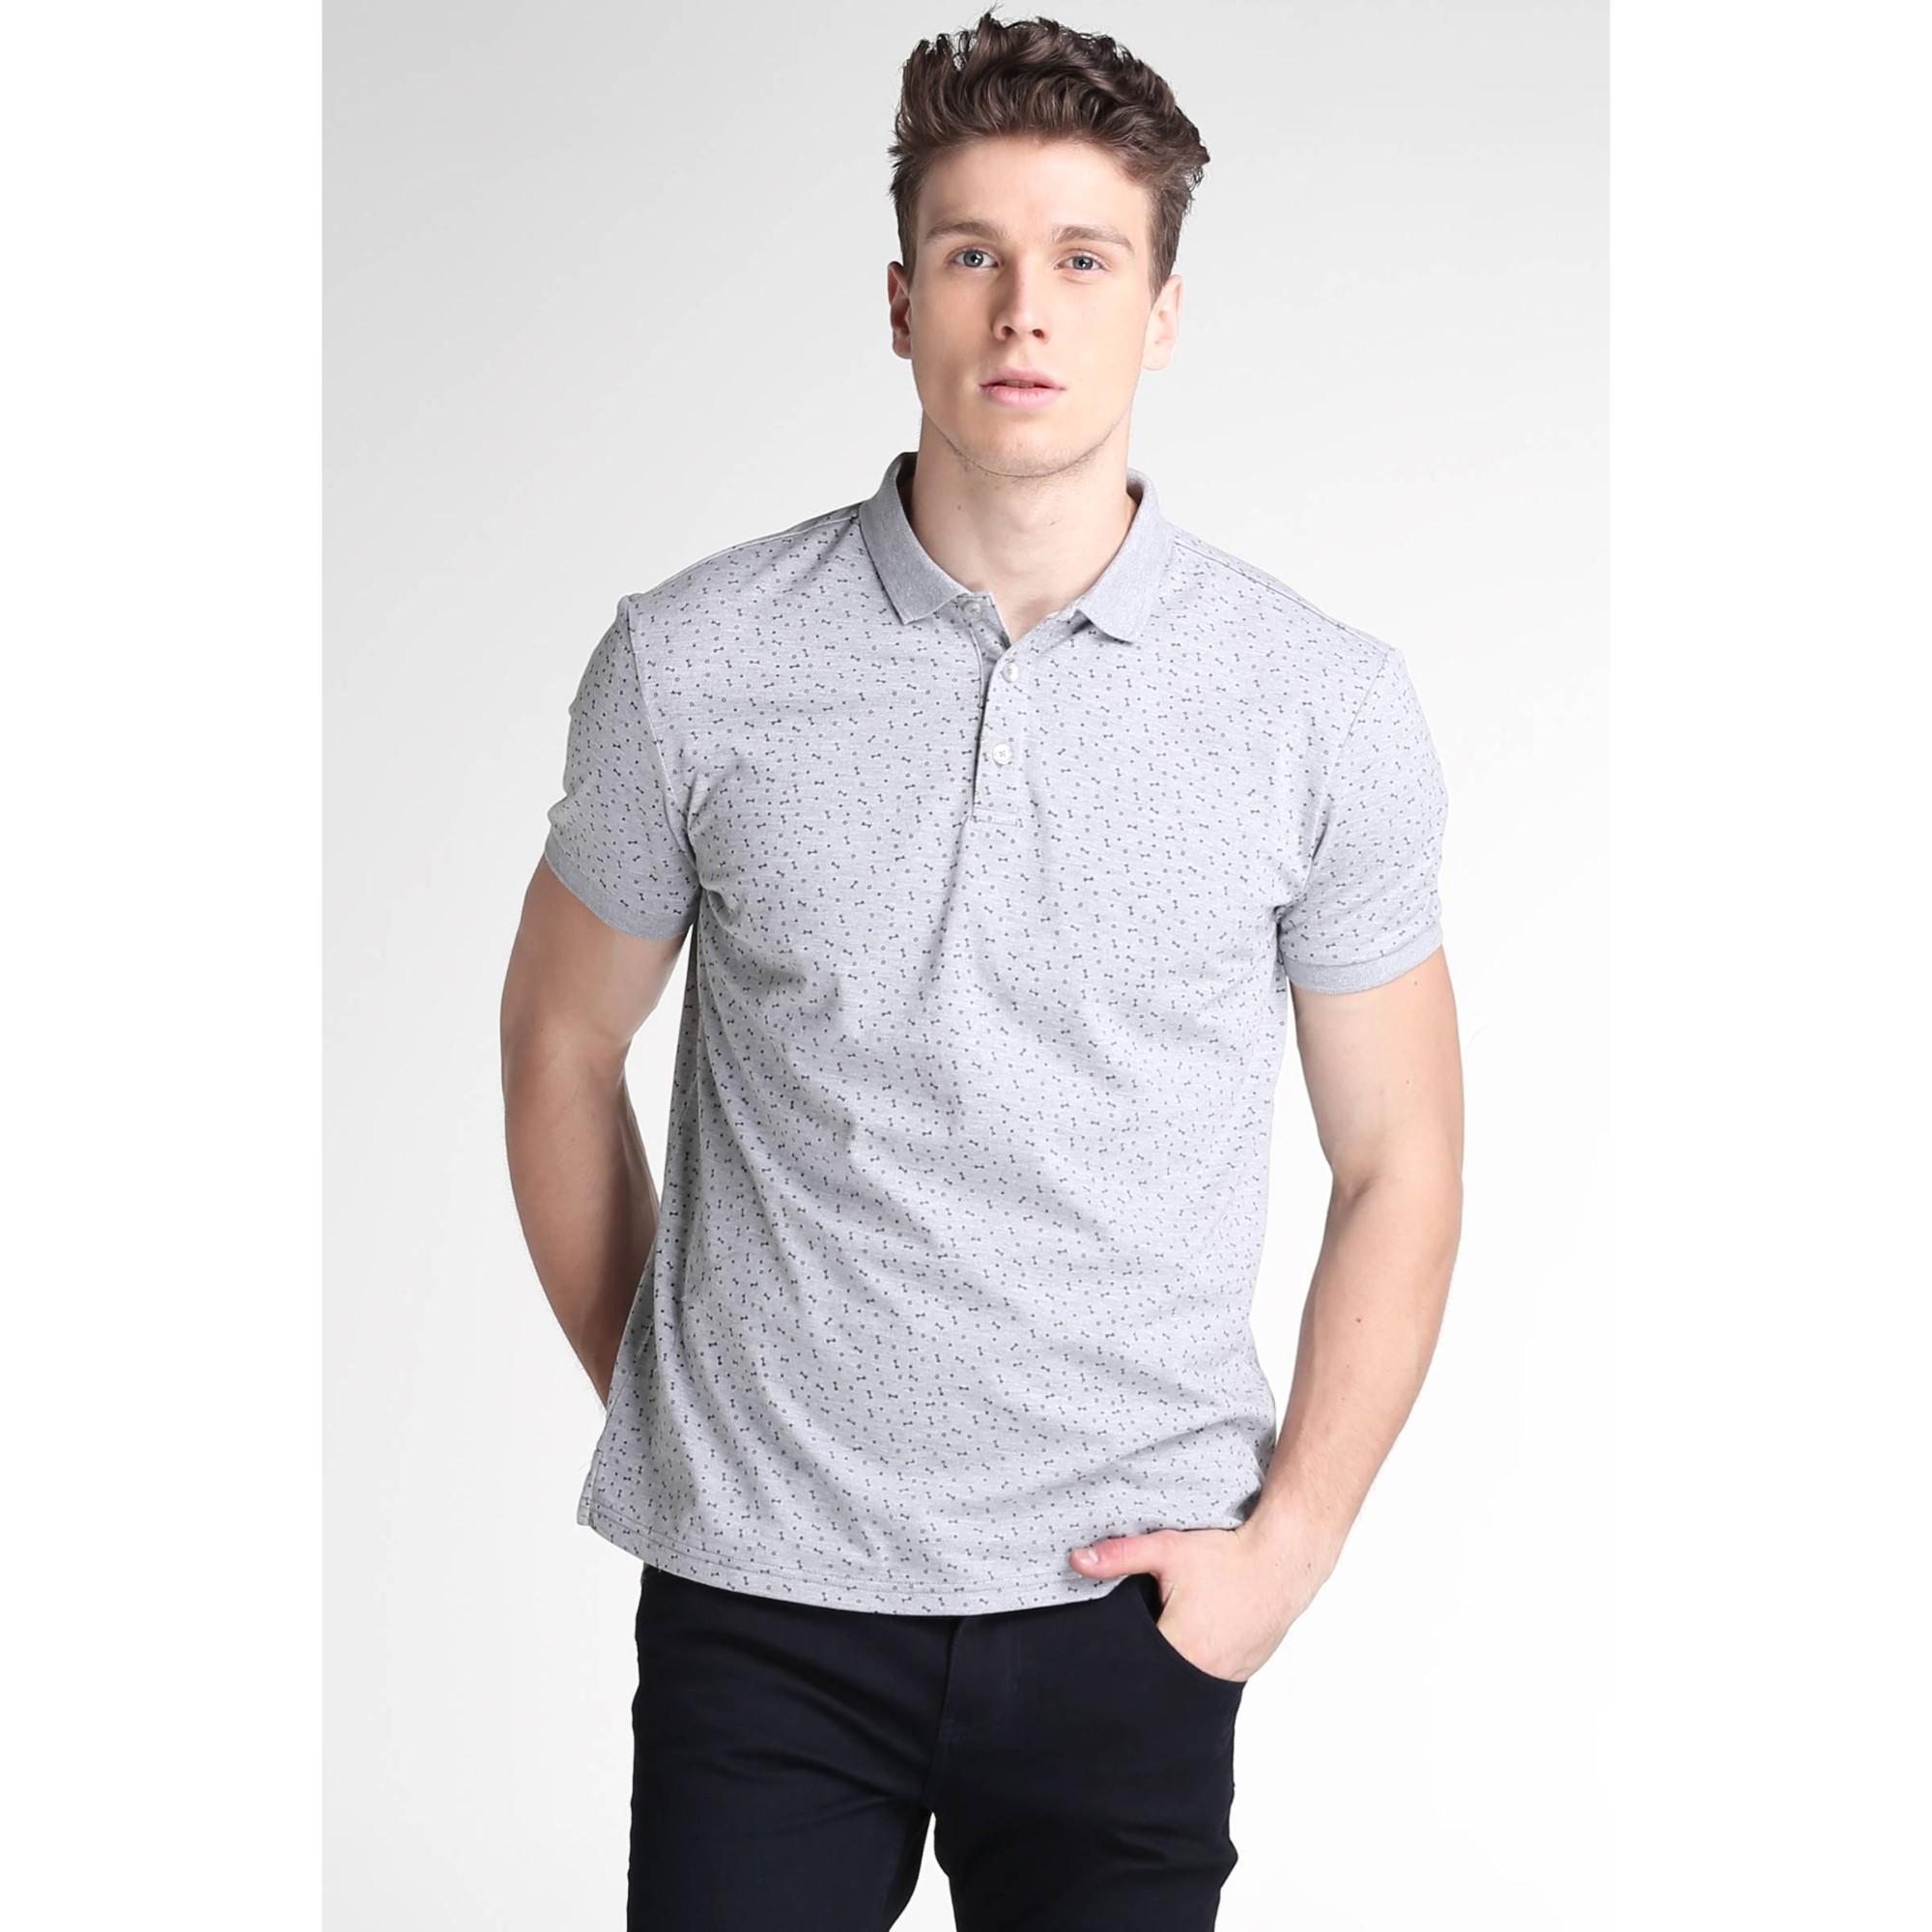 618ed04e1ff3 Penshoppe Polo Shirt Price Philippines